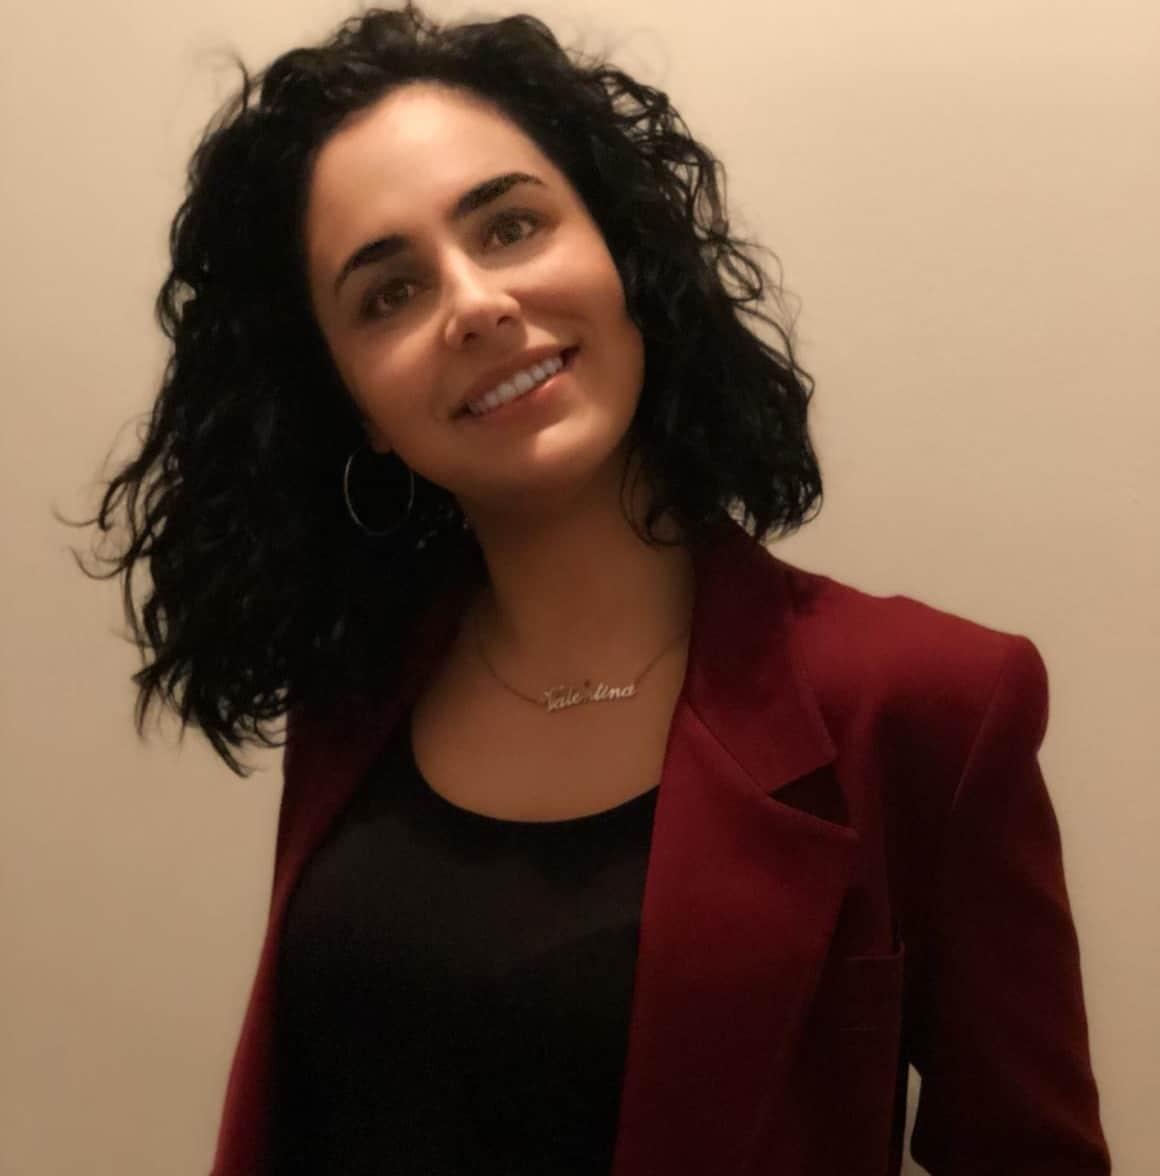 Valentina, Laureanda In Giurisprudenza, Racconta La Sua Esperienza | aivm.it